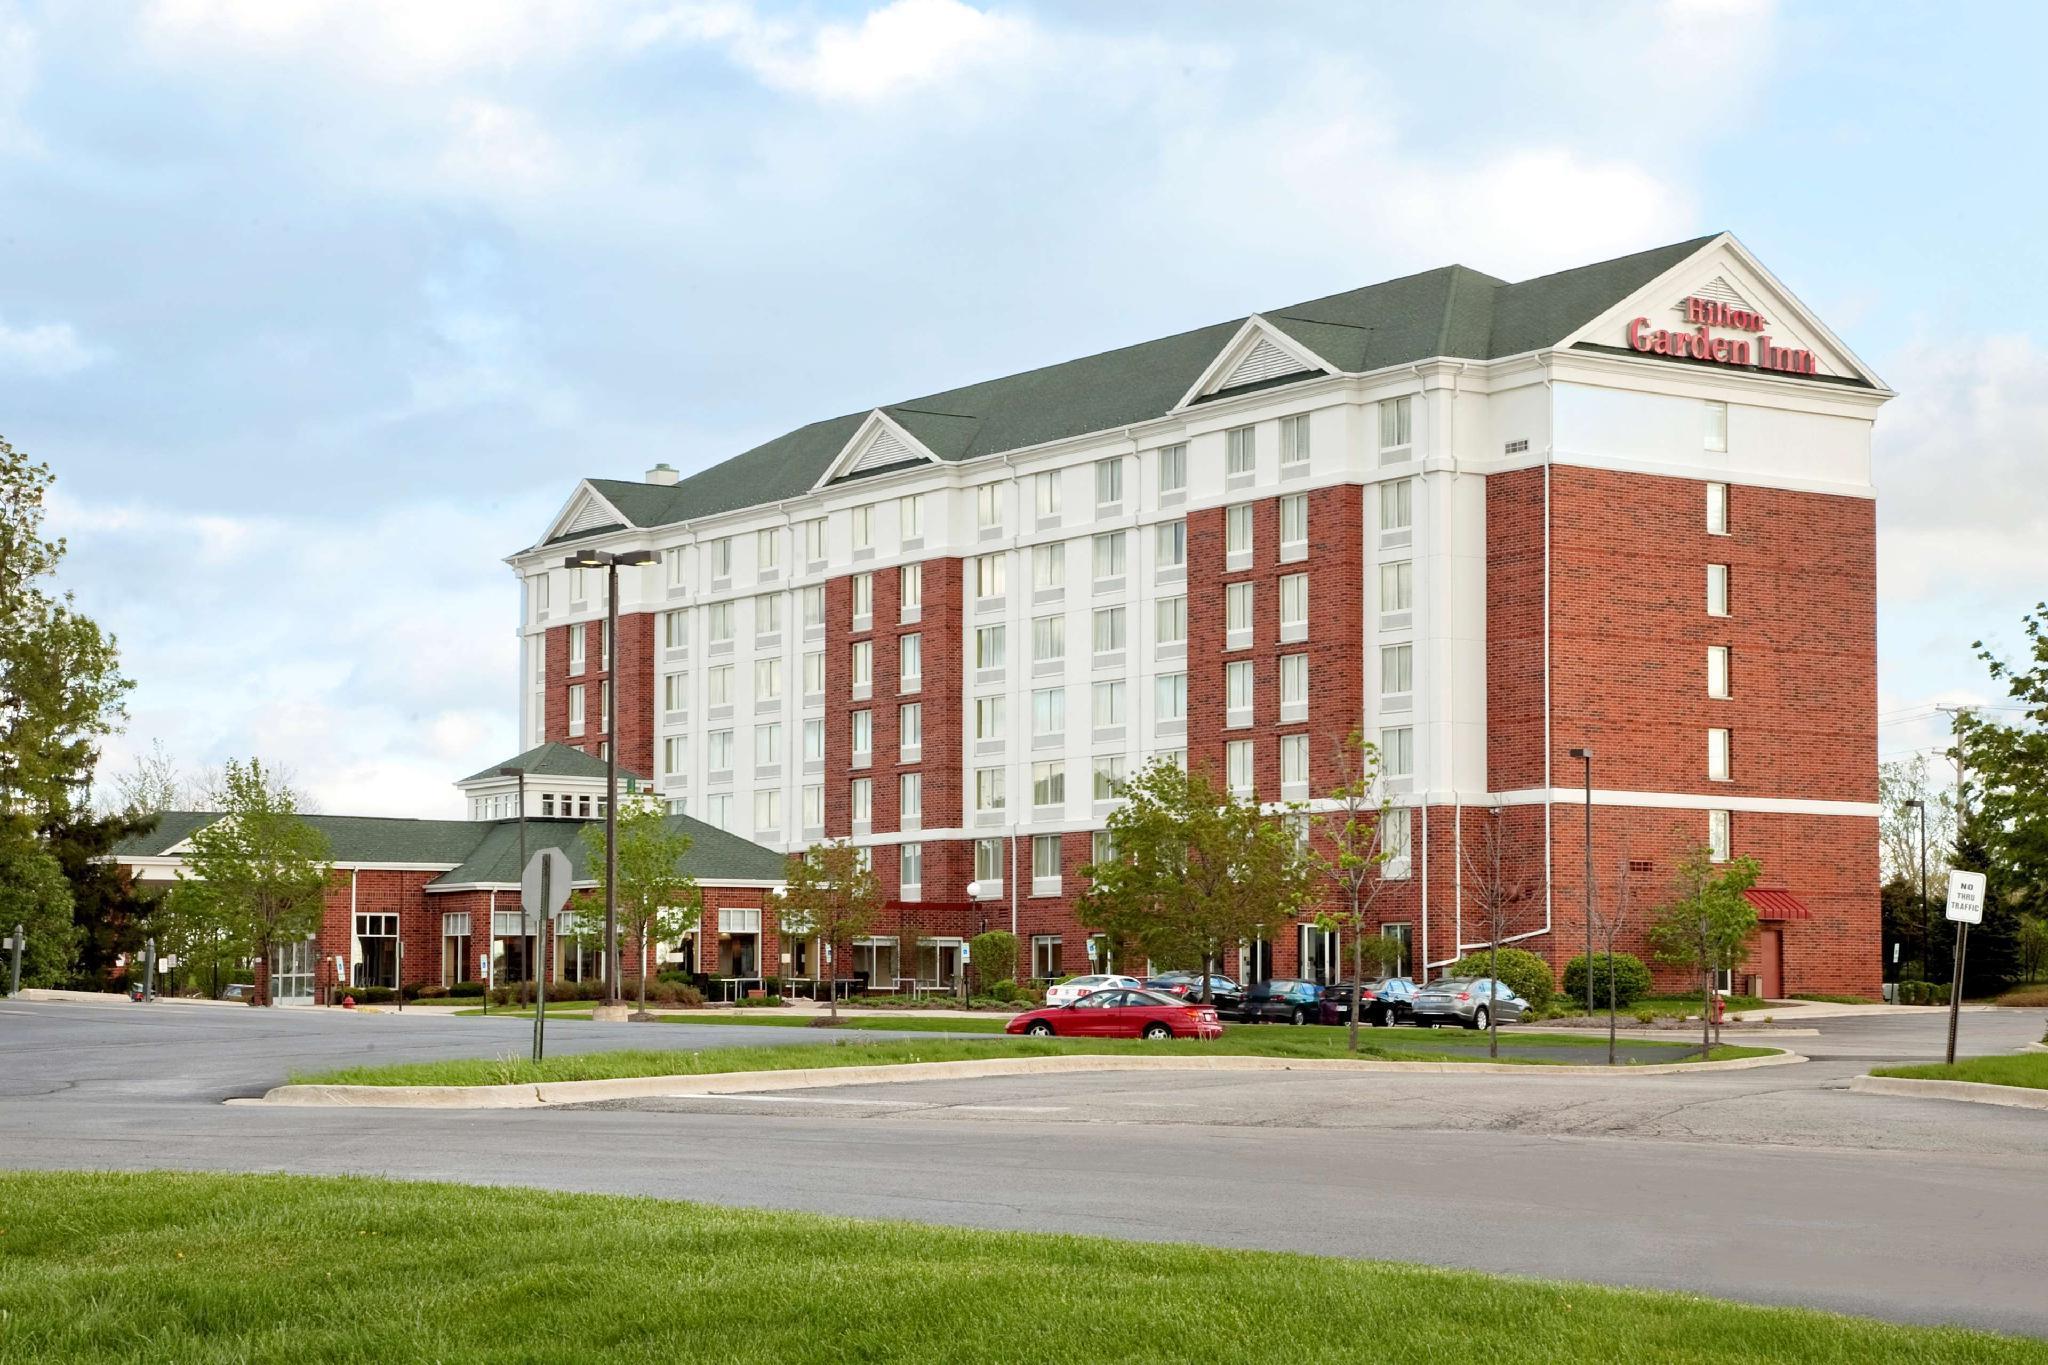 Hilton Garden Inn Hoffman Estates Hotel